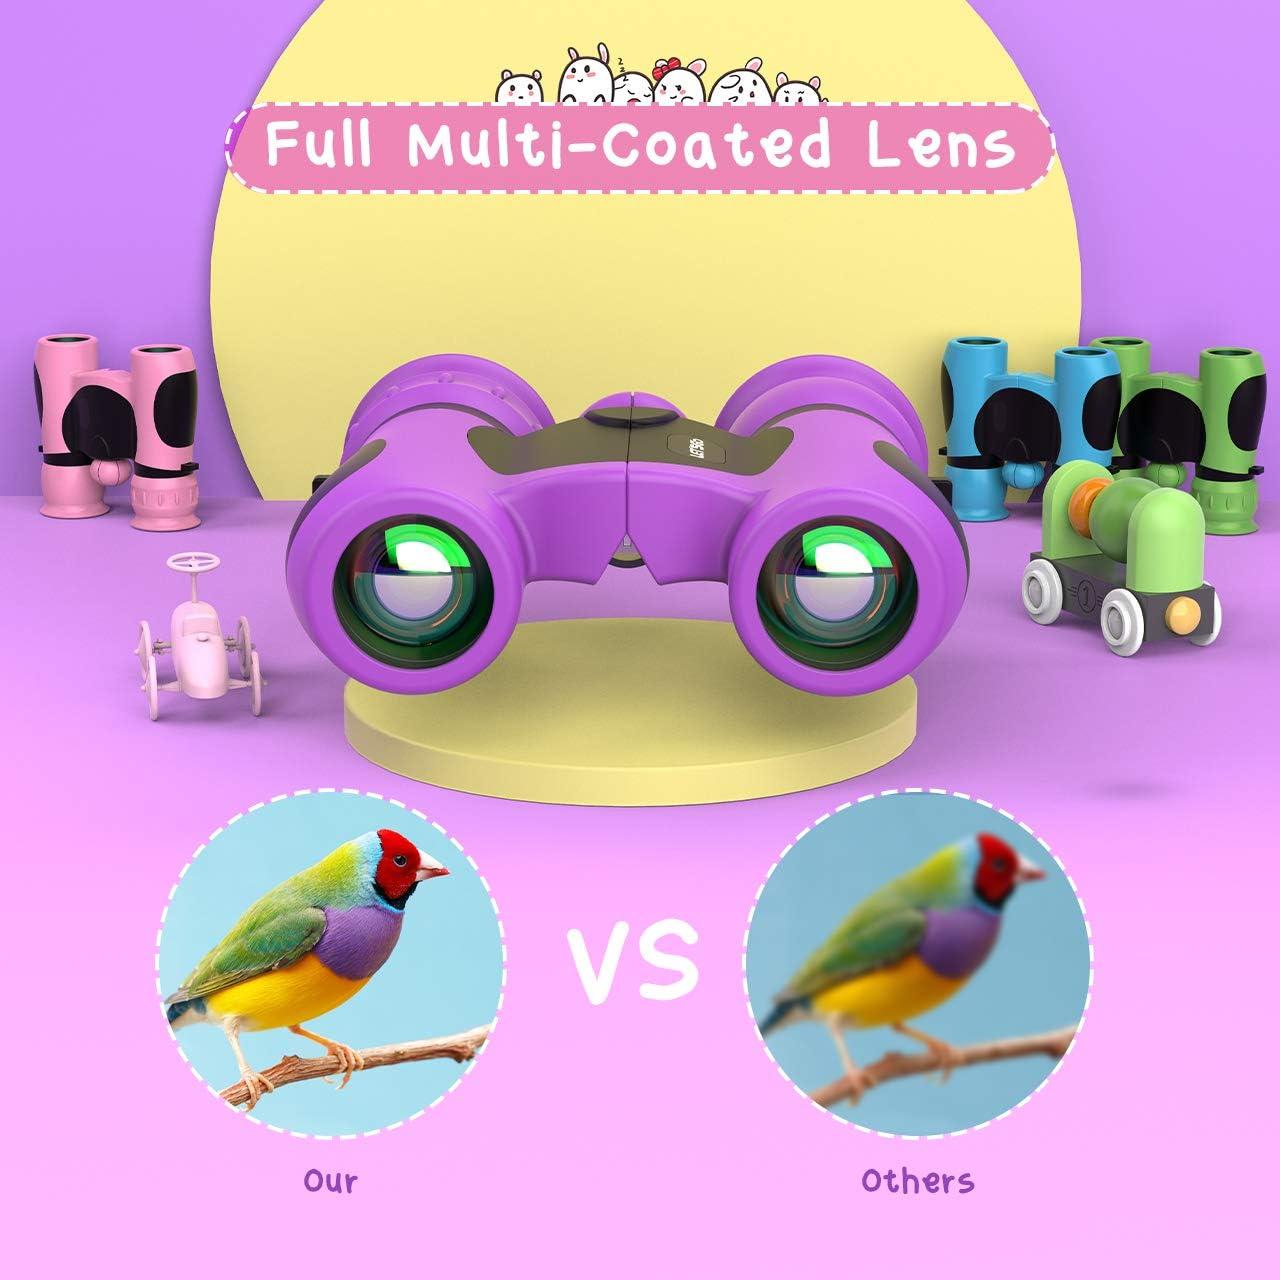 LetsGO toyz Upgraded Compact Shockproof Binocular for Kids Best Birthday Toys Xmas Gifts